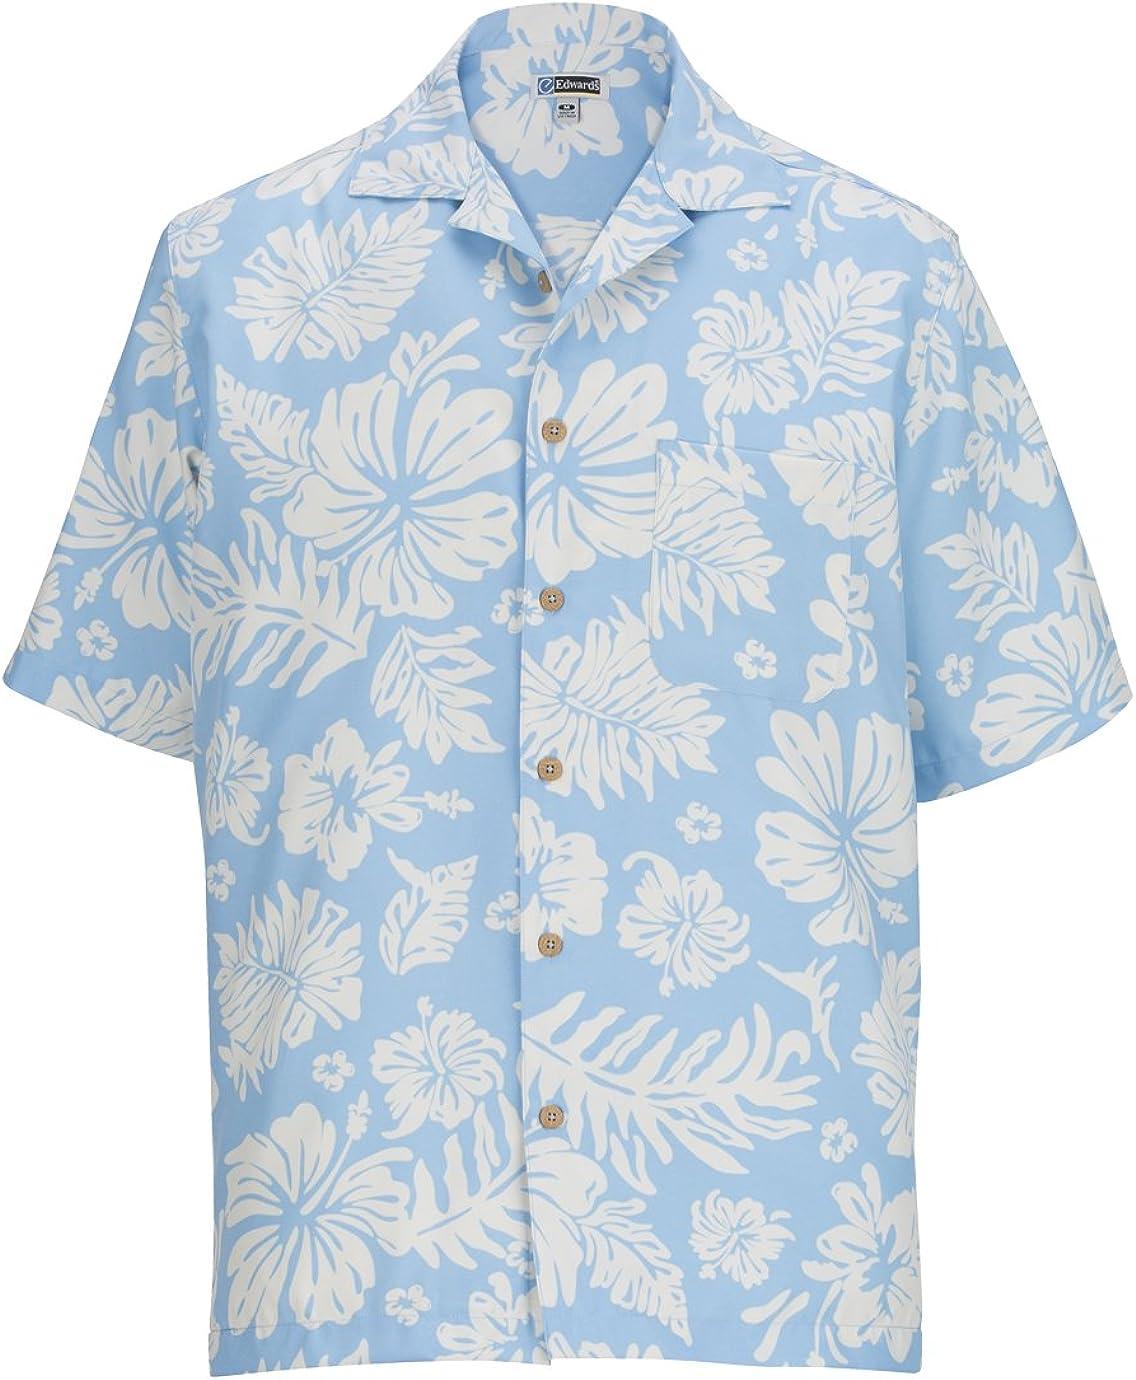 Ed Garments Men's Classic Camp Pocket Shirt,Blue, XXXXX-Large